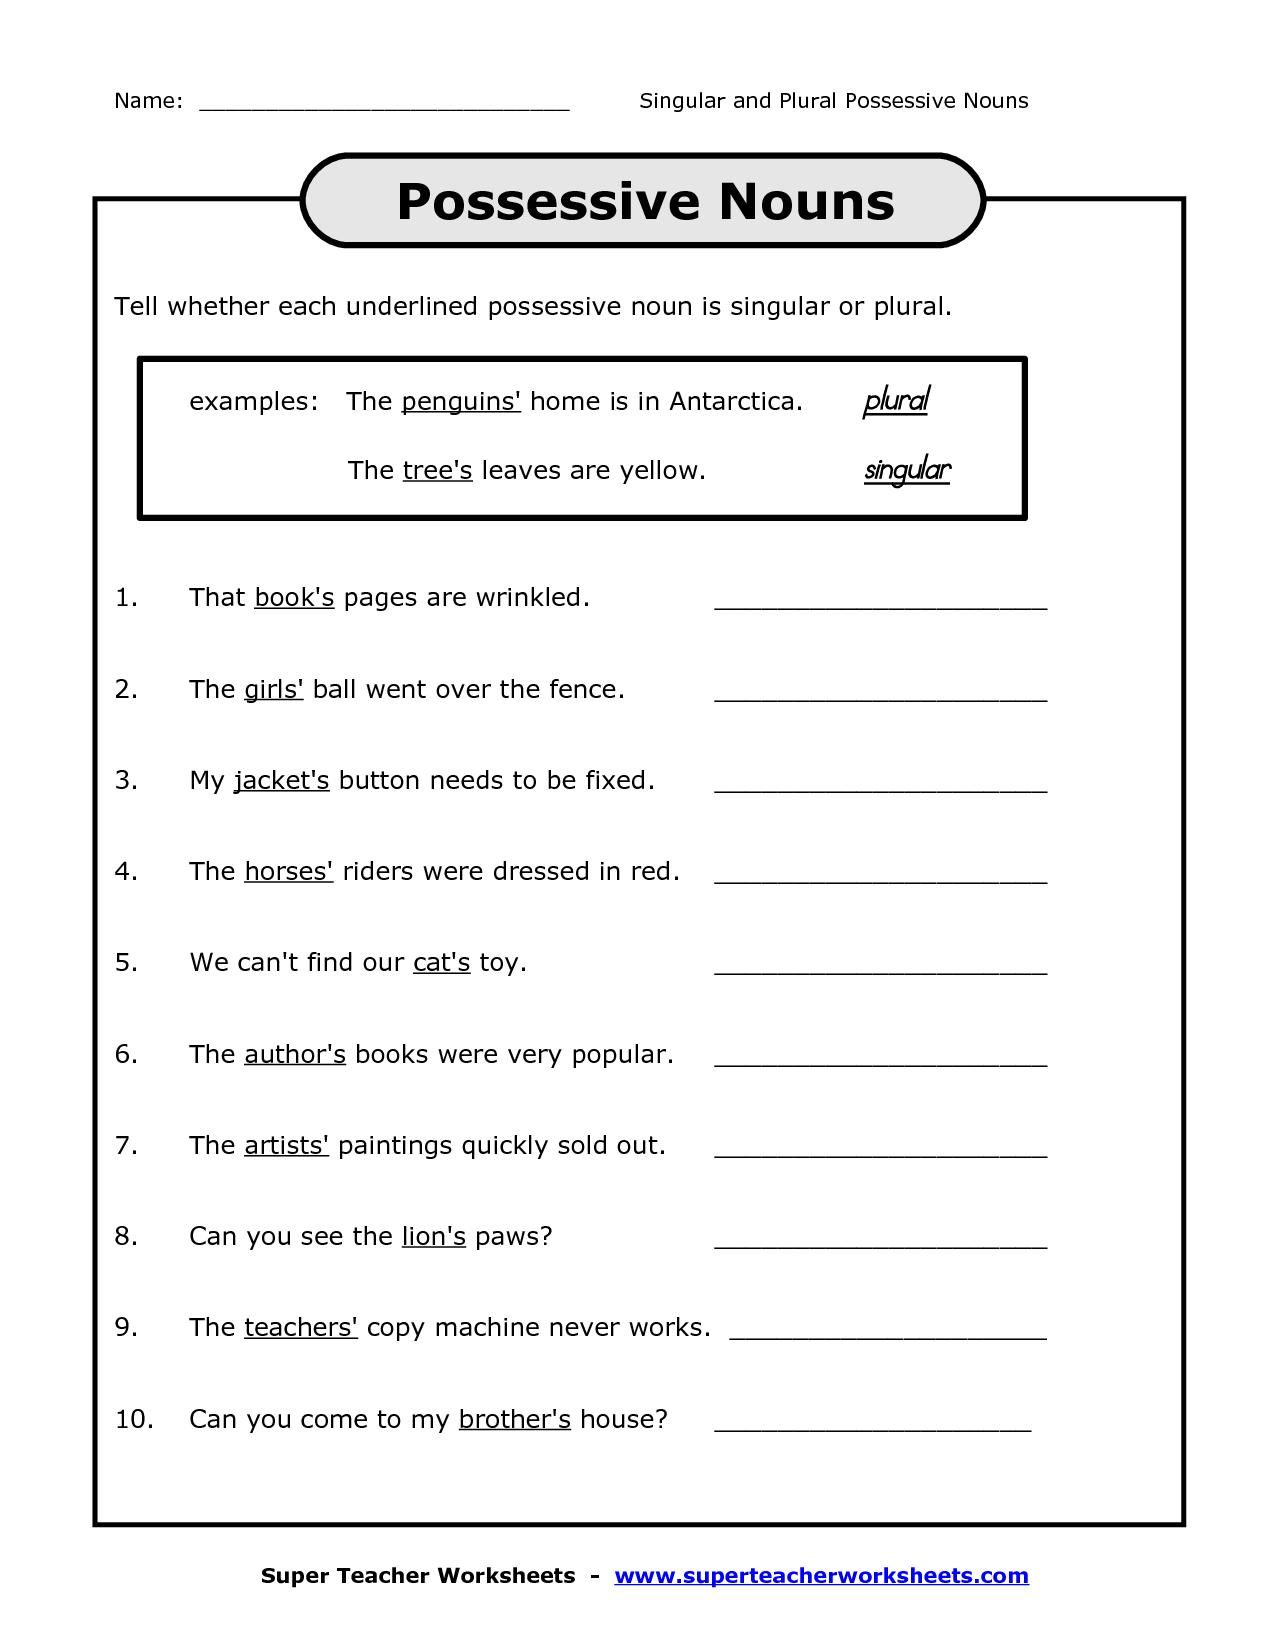 19 Best Images Of Possessive Pronouns Worksheets For Esl